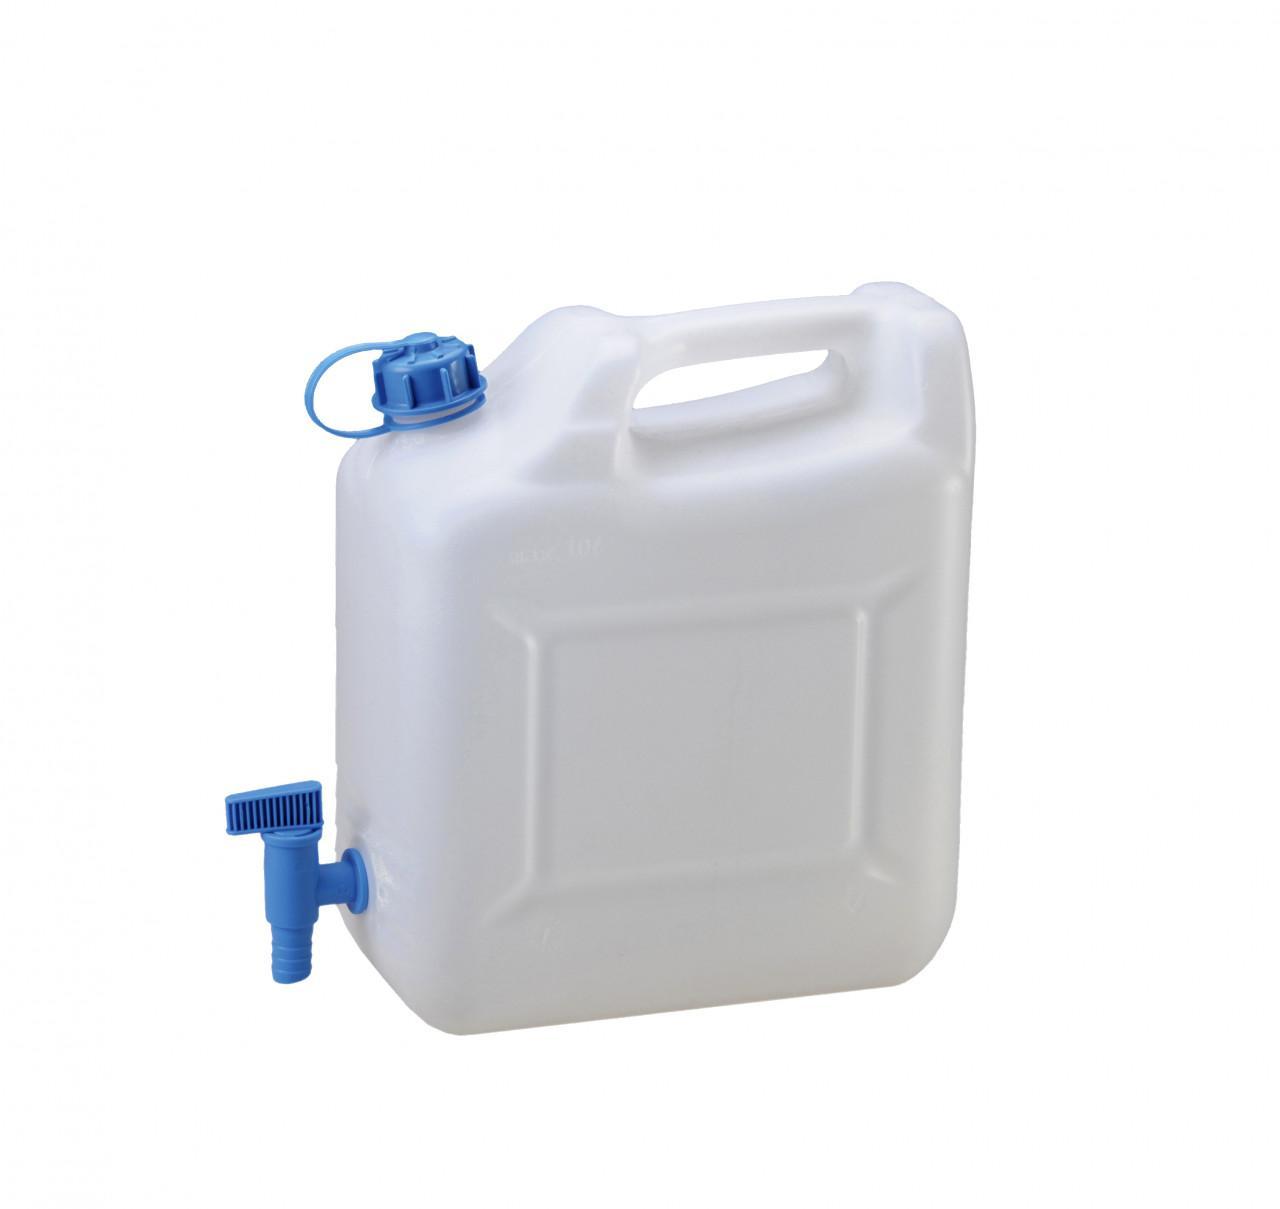 Hünersdorff Wasserkanister Eco 12 Liter   4007228817508